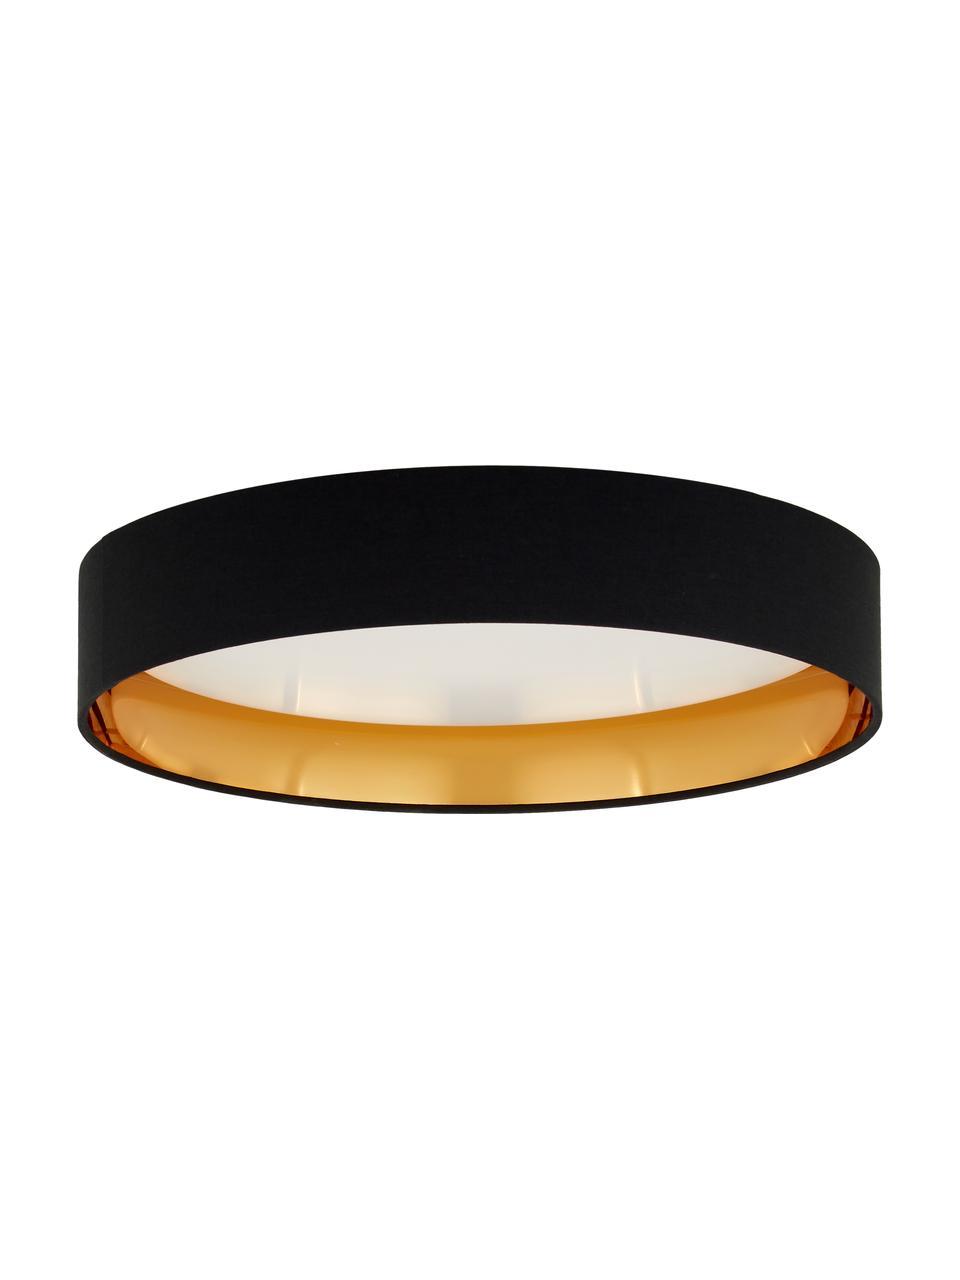 Plafonnier LED rond noir Mallory, Noir